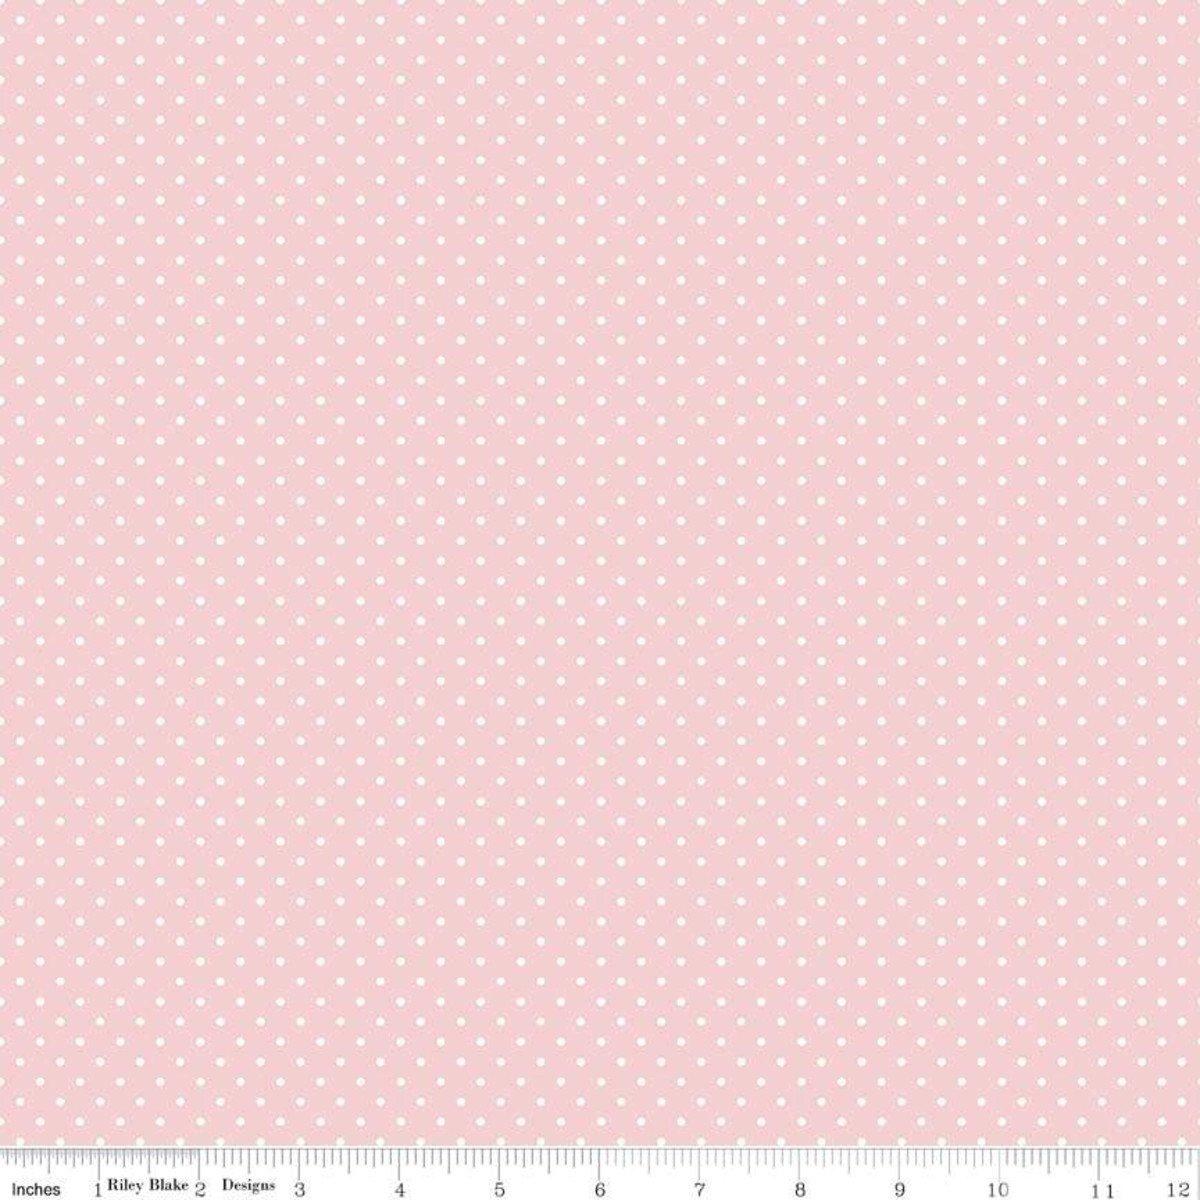 Riley Blake Designs, Swiss Dot - Swiss Dot Baby Pink